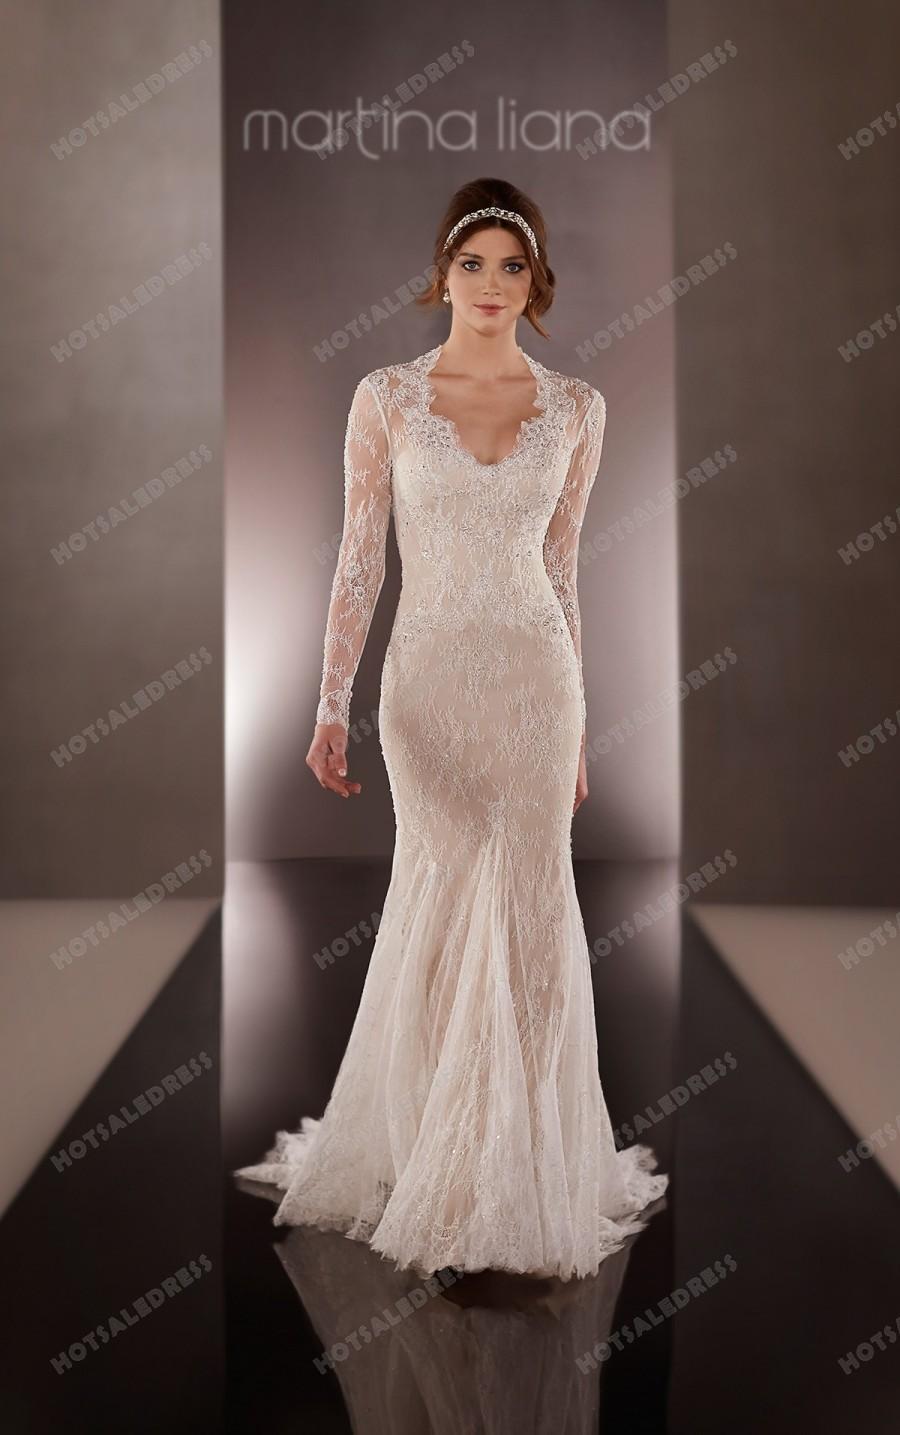 Wedding - Martina Liana Lace Sleeve Wedding Dress Style 699